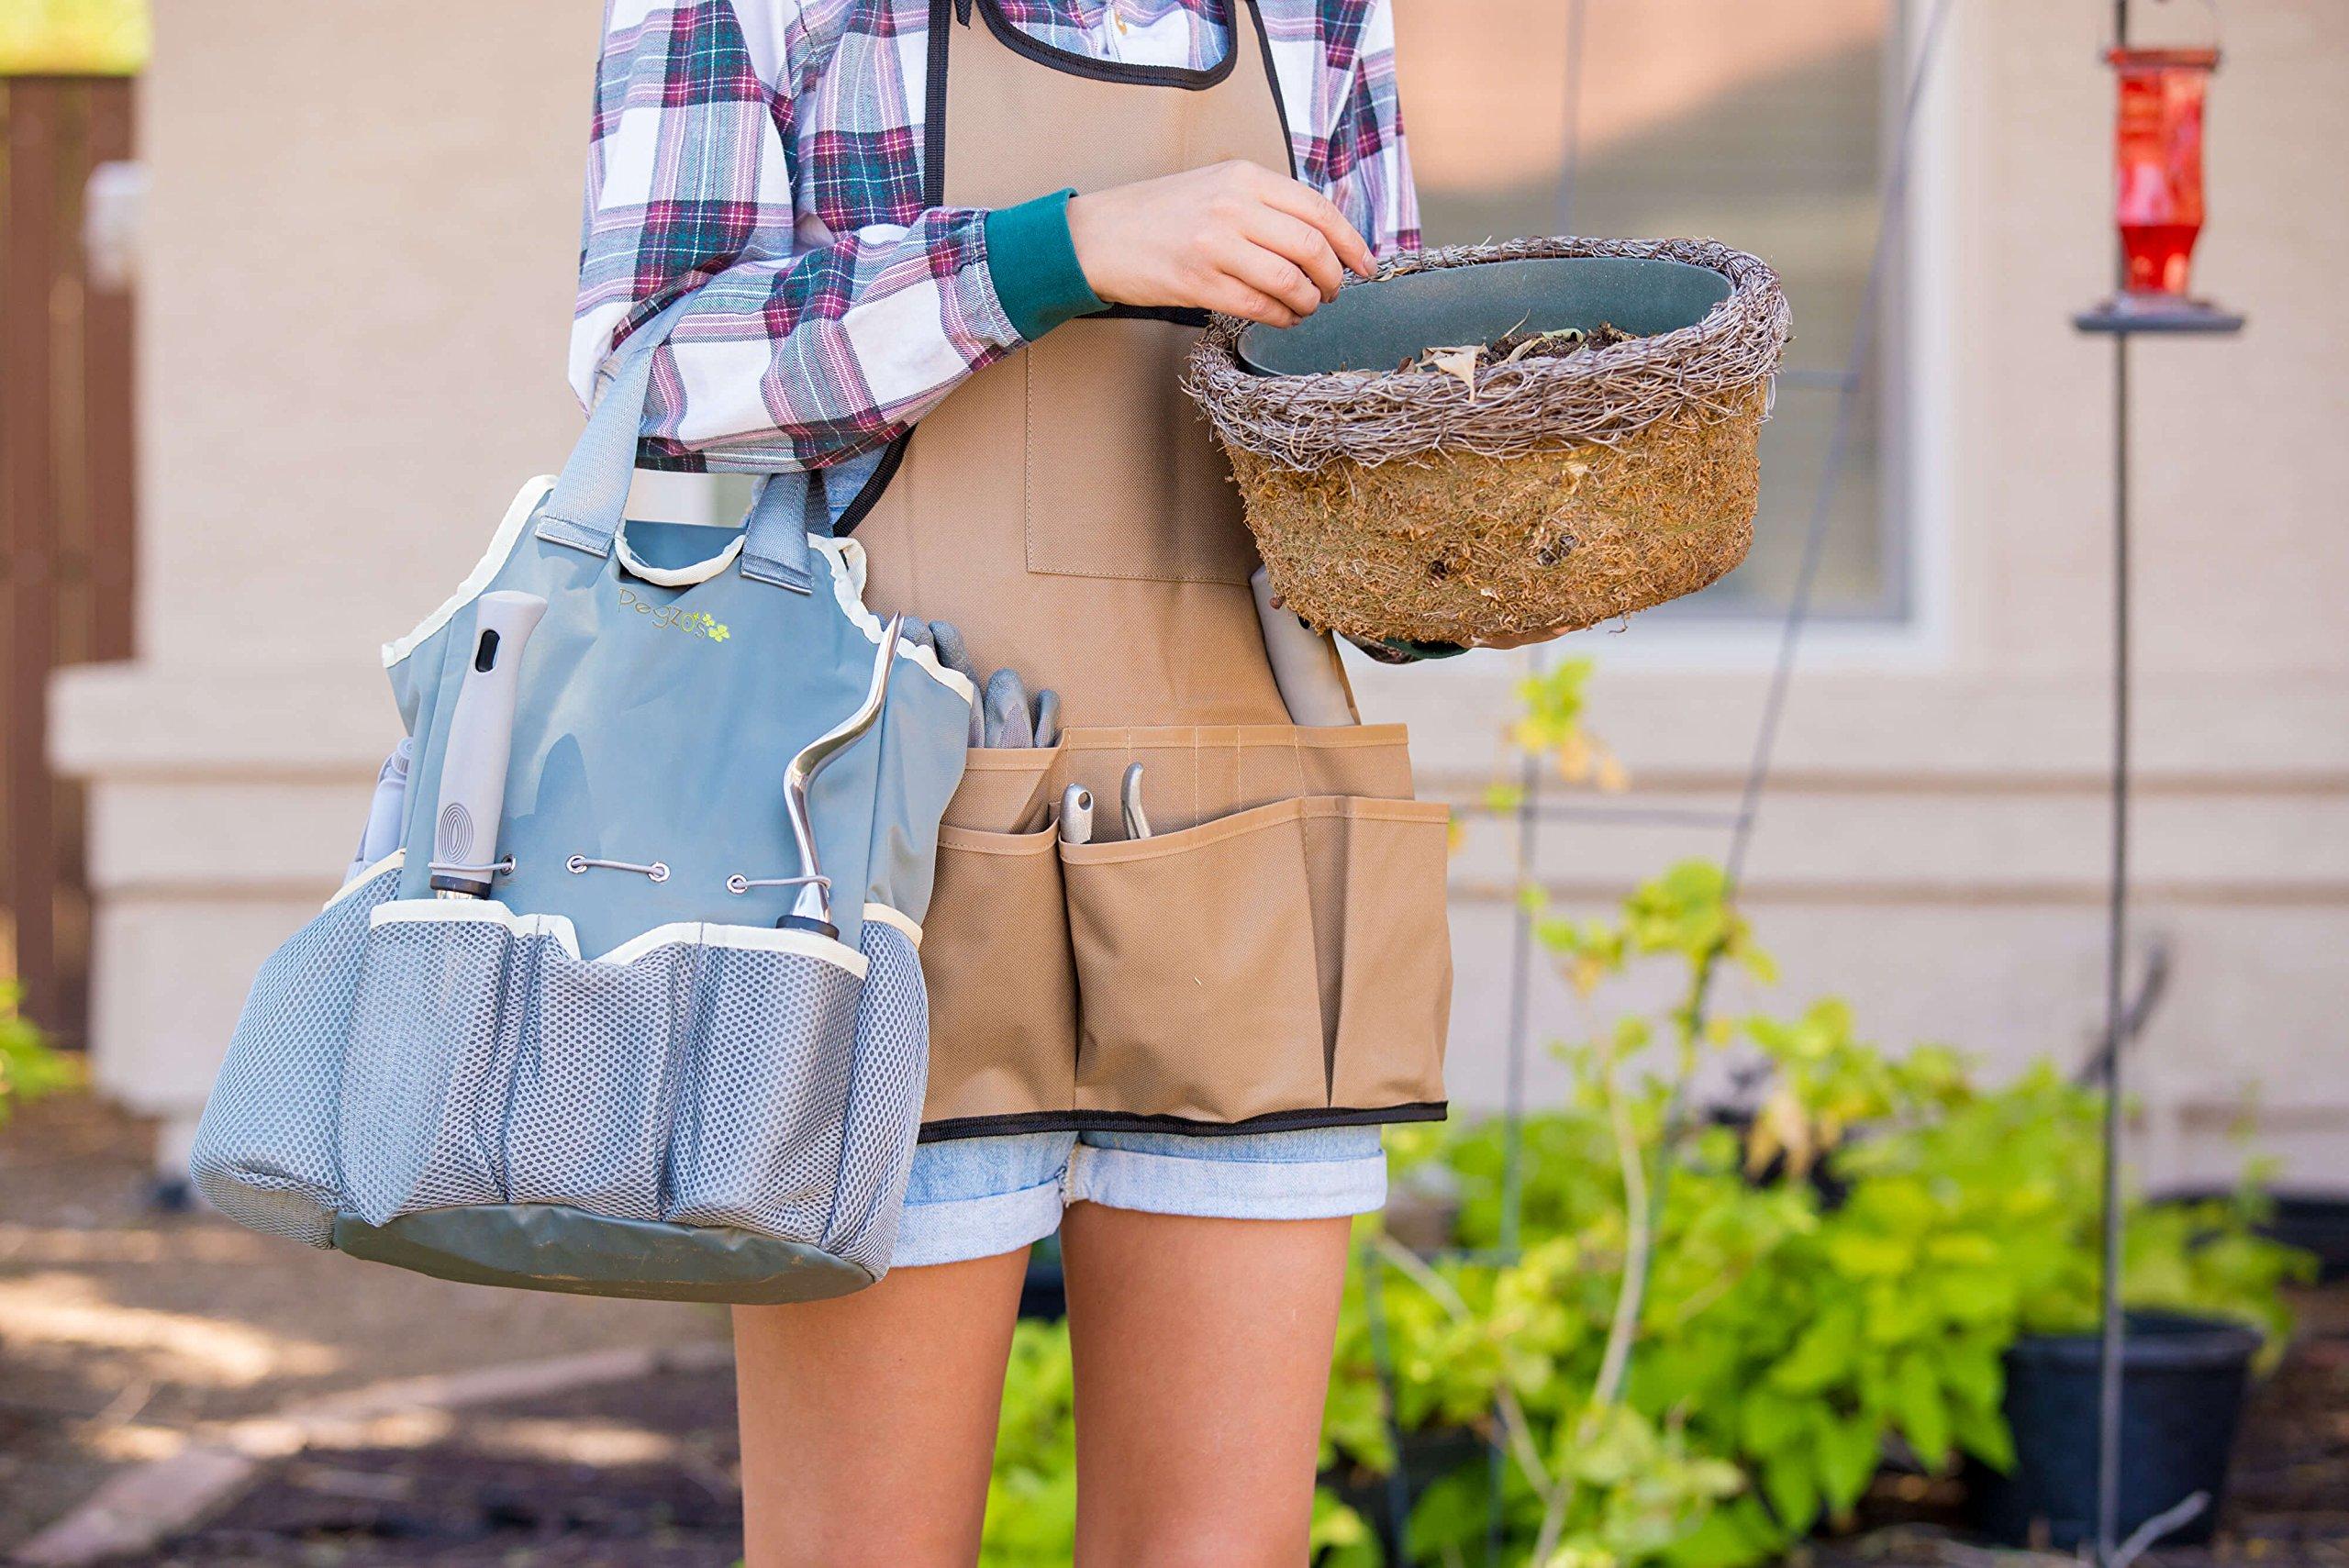 PEGZOS 10 Piece Garden Tools Set Gardening Tools with Garden Gloves, Gardener Apron and Garden Storage Tote, Gardening with Garden Trowel Pruners Clippers, Garden Hand Tools by PEGZOS (Image #7)